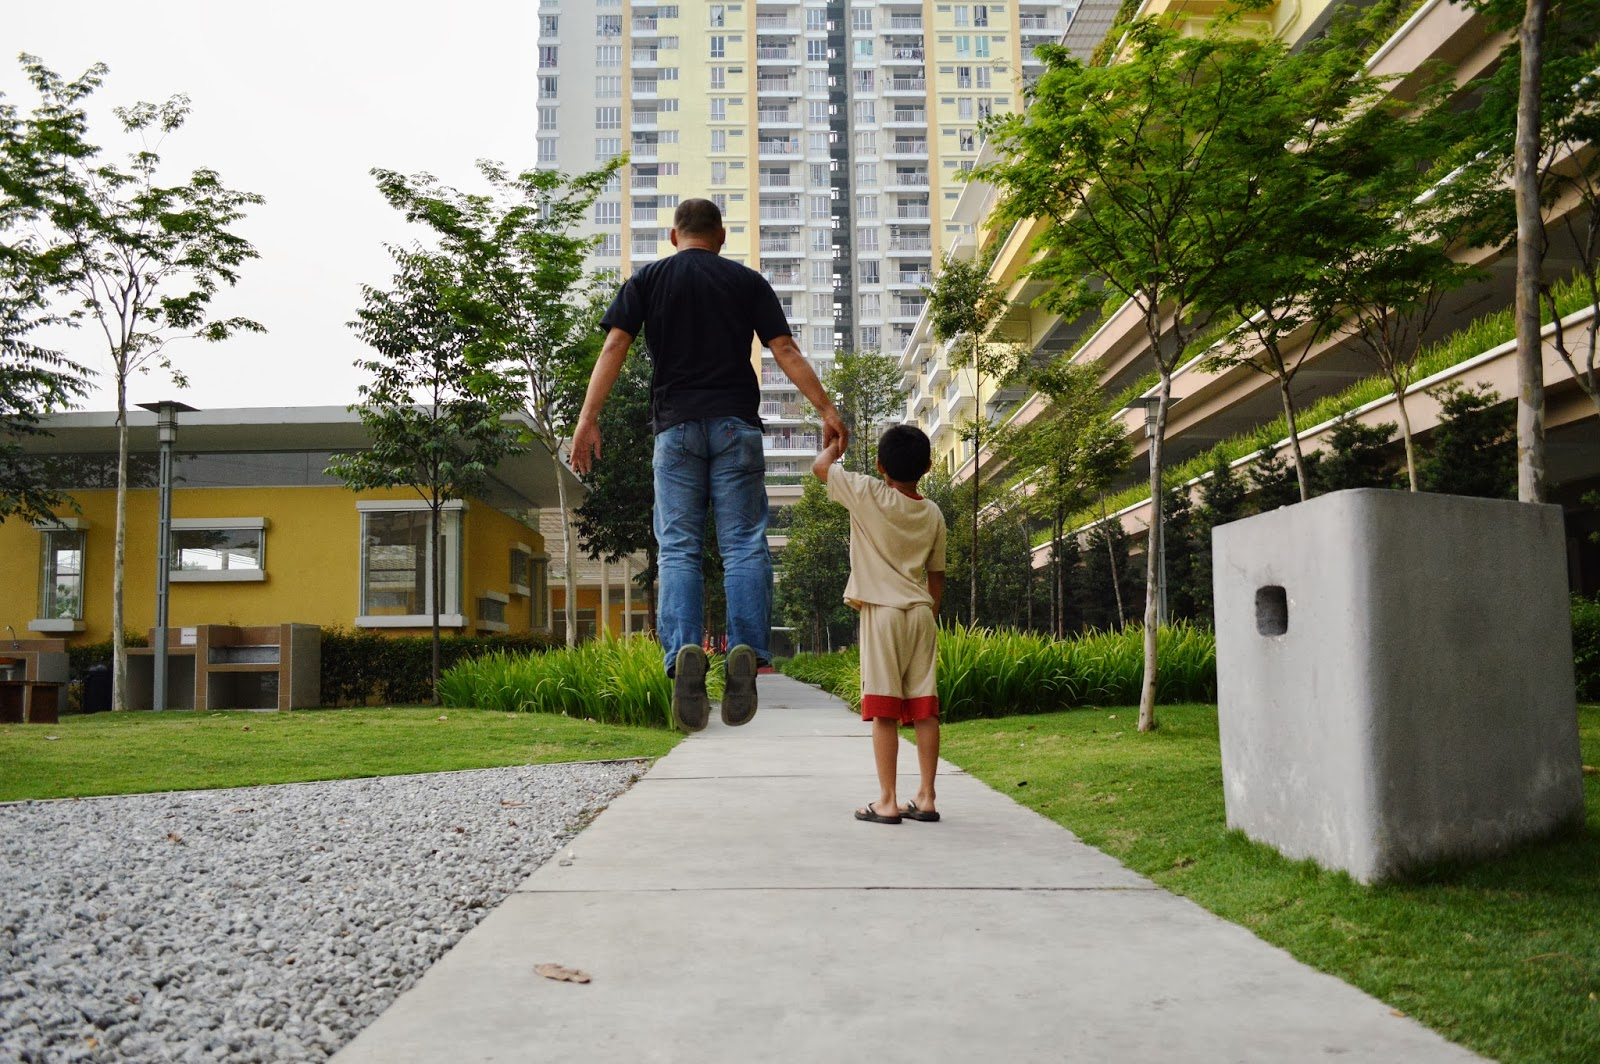 Levitation photo - Hold my hand